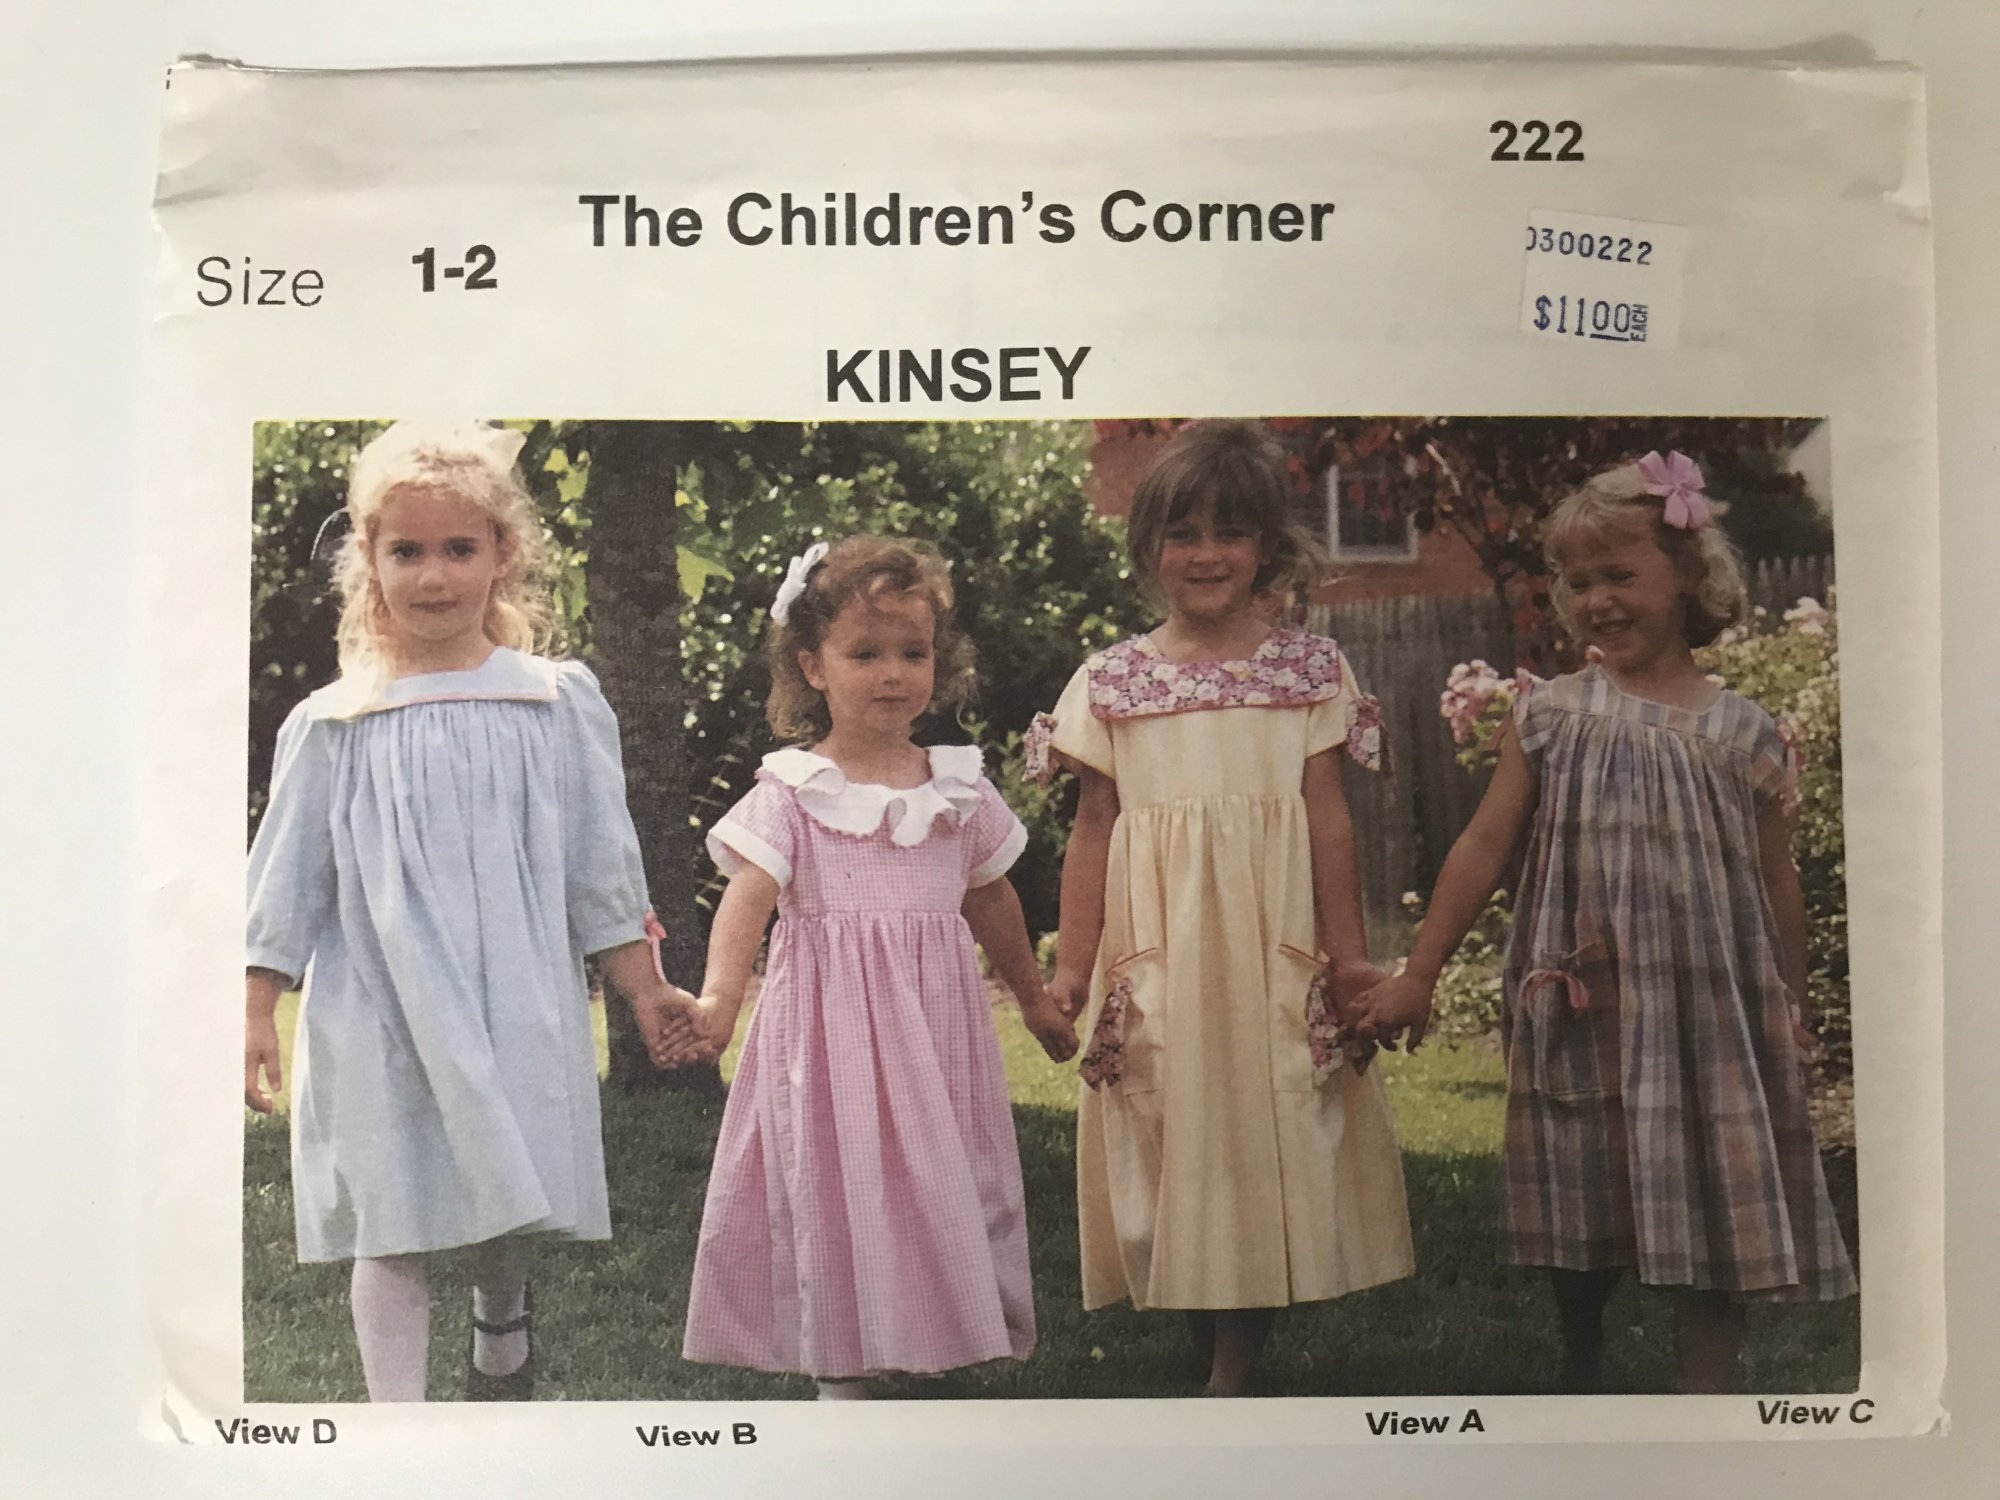 CHILDREN'S CORNER KINSEY